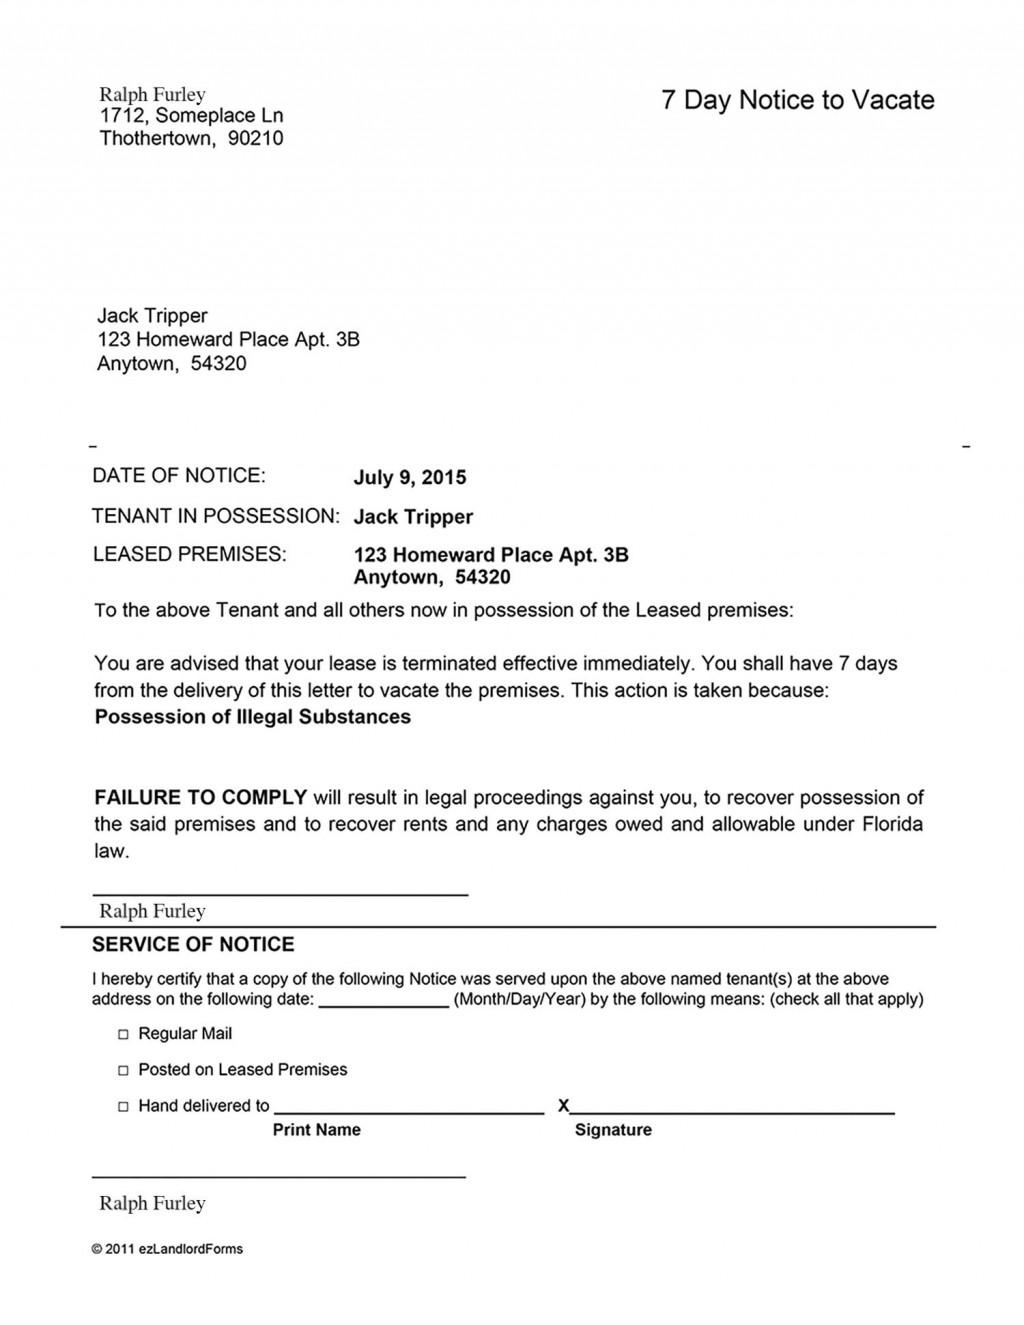 004 Wonderful Eviction Notice Florida Template Highest Quality  15 Day Free PrintableLarge